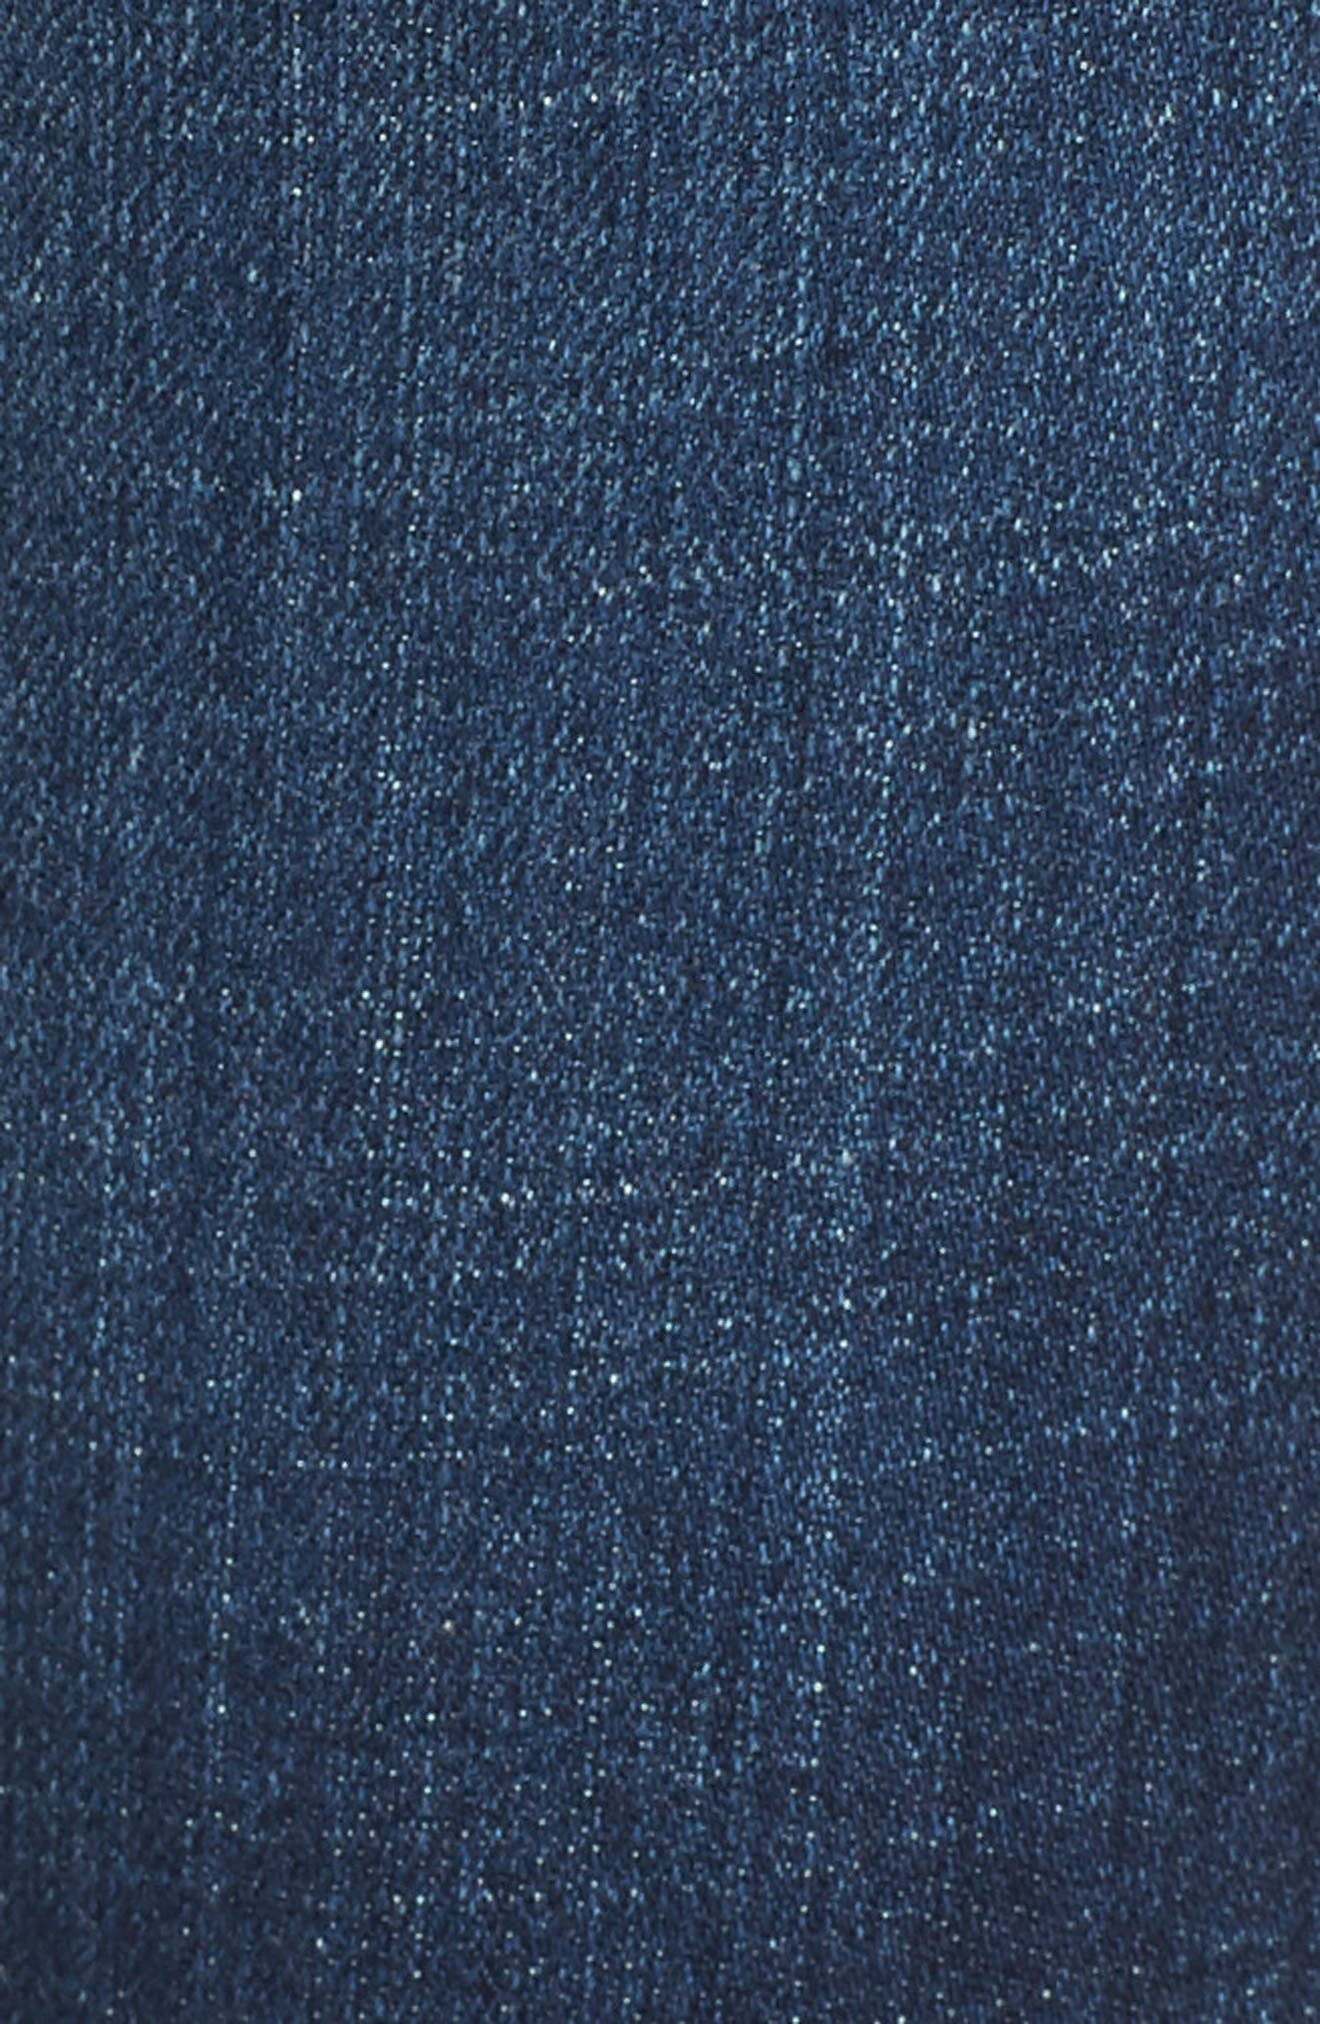 Rocket High Waist Skinny Jeans,                             Alternate thumbnail 6, color,                             428